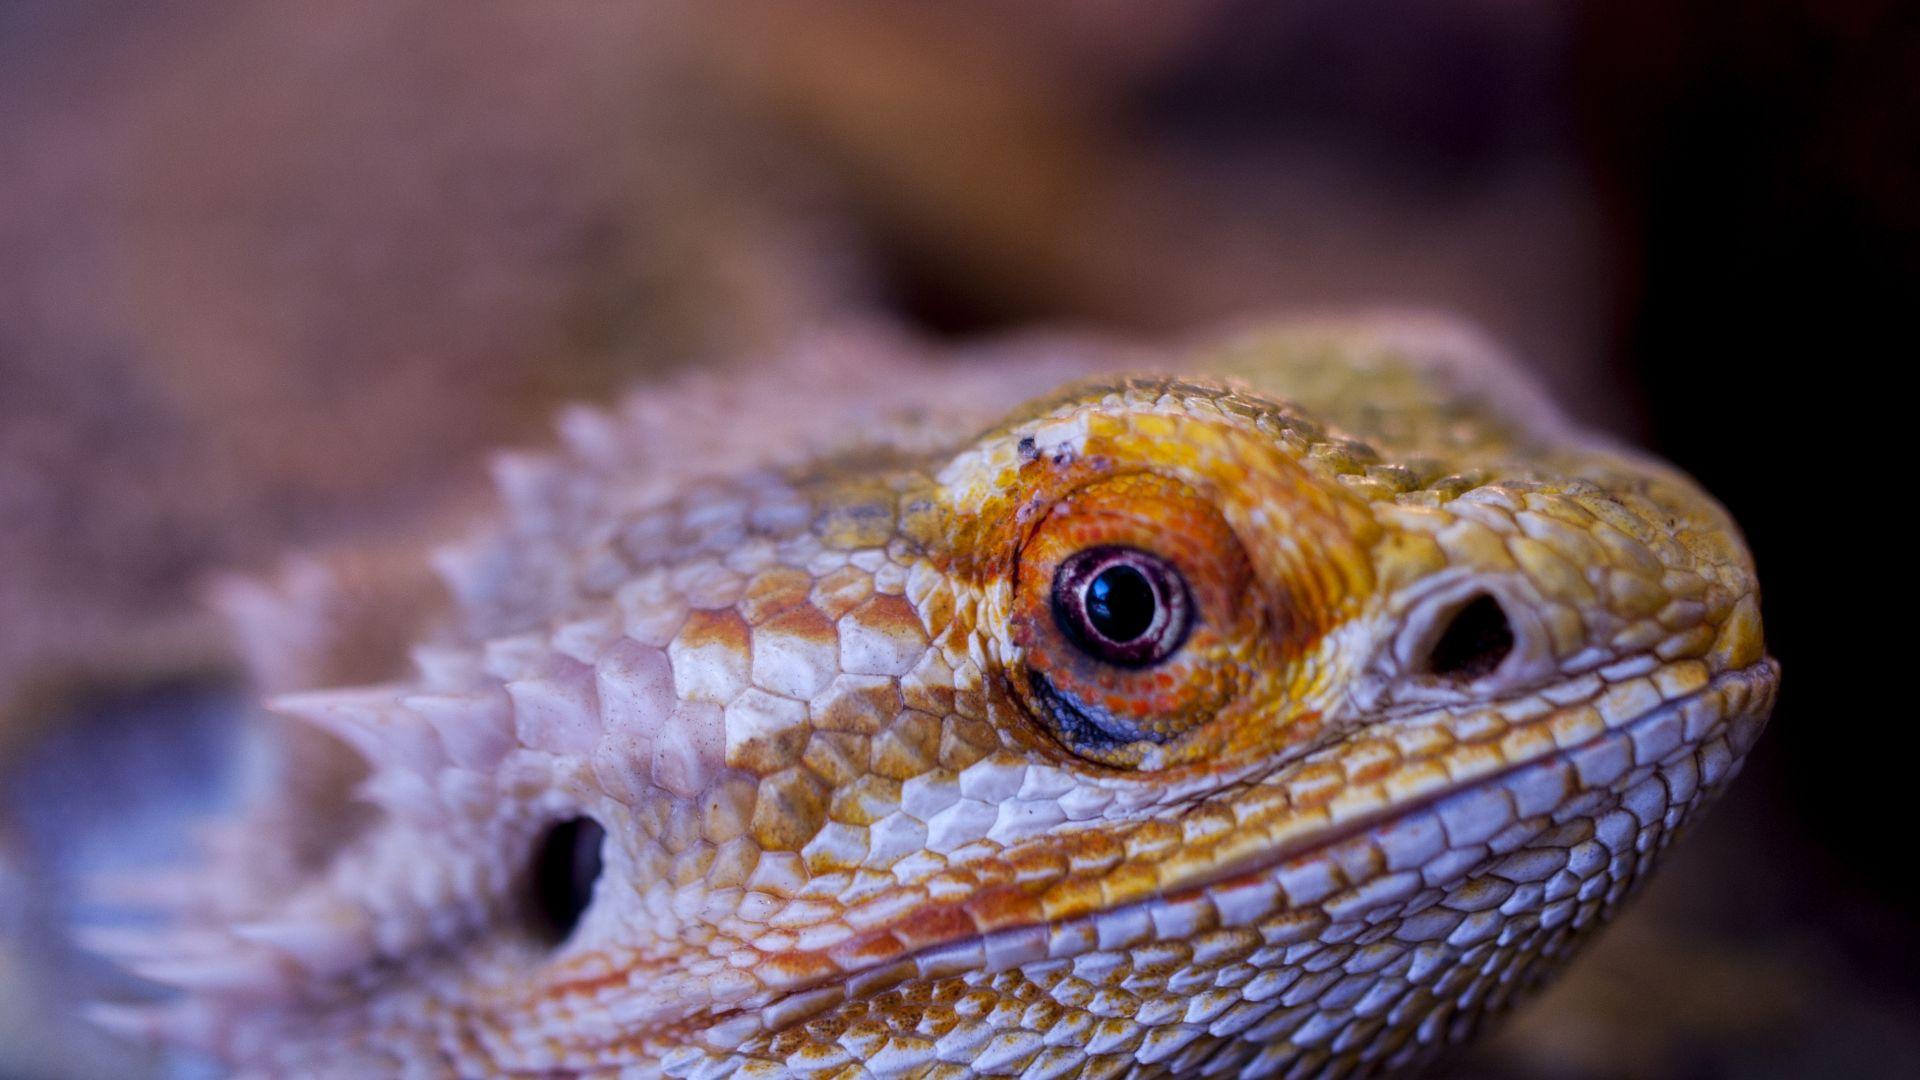 Wallpaper Bearded, Agama, lizard, reptile, muzzle